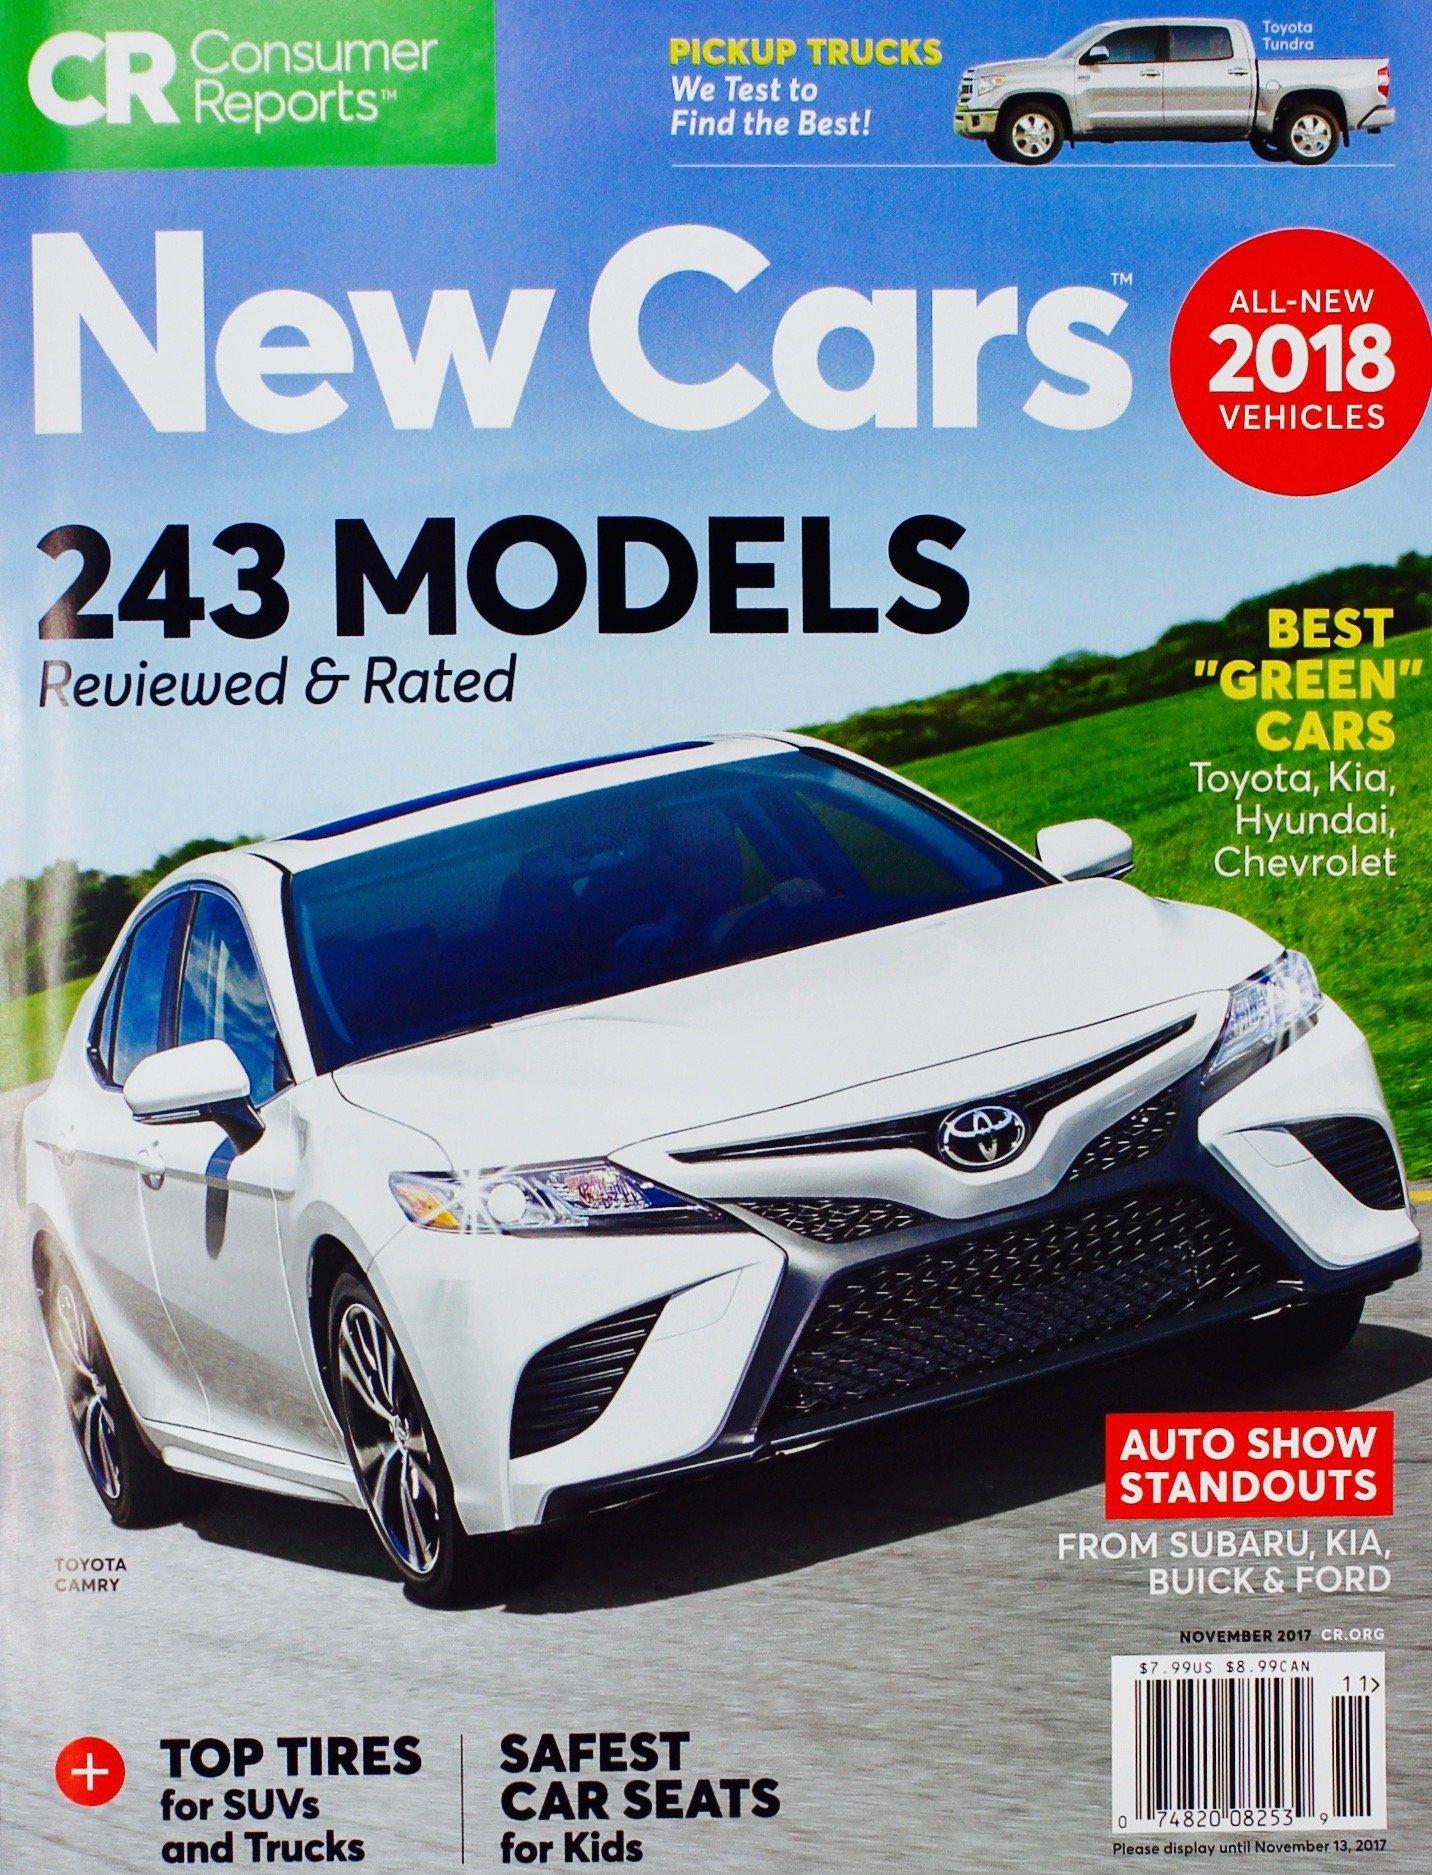 Consumer reports buying guide new cars trucks suvs november 2017 243 models consumer reports 0074820082539 amazon com books